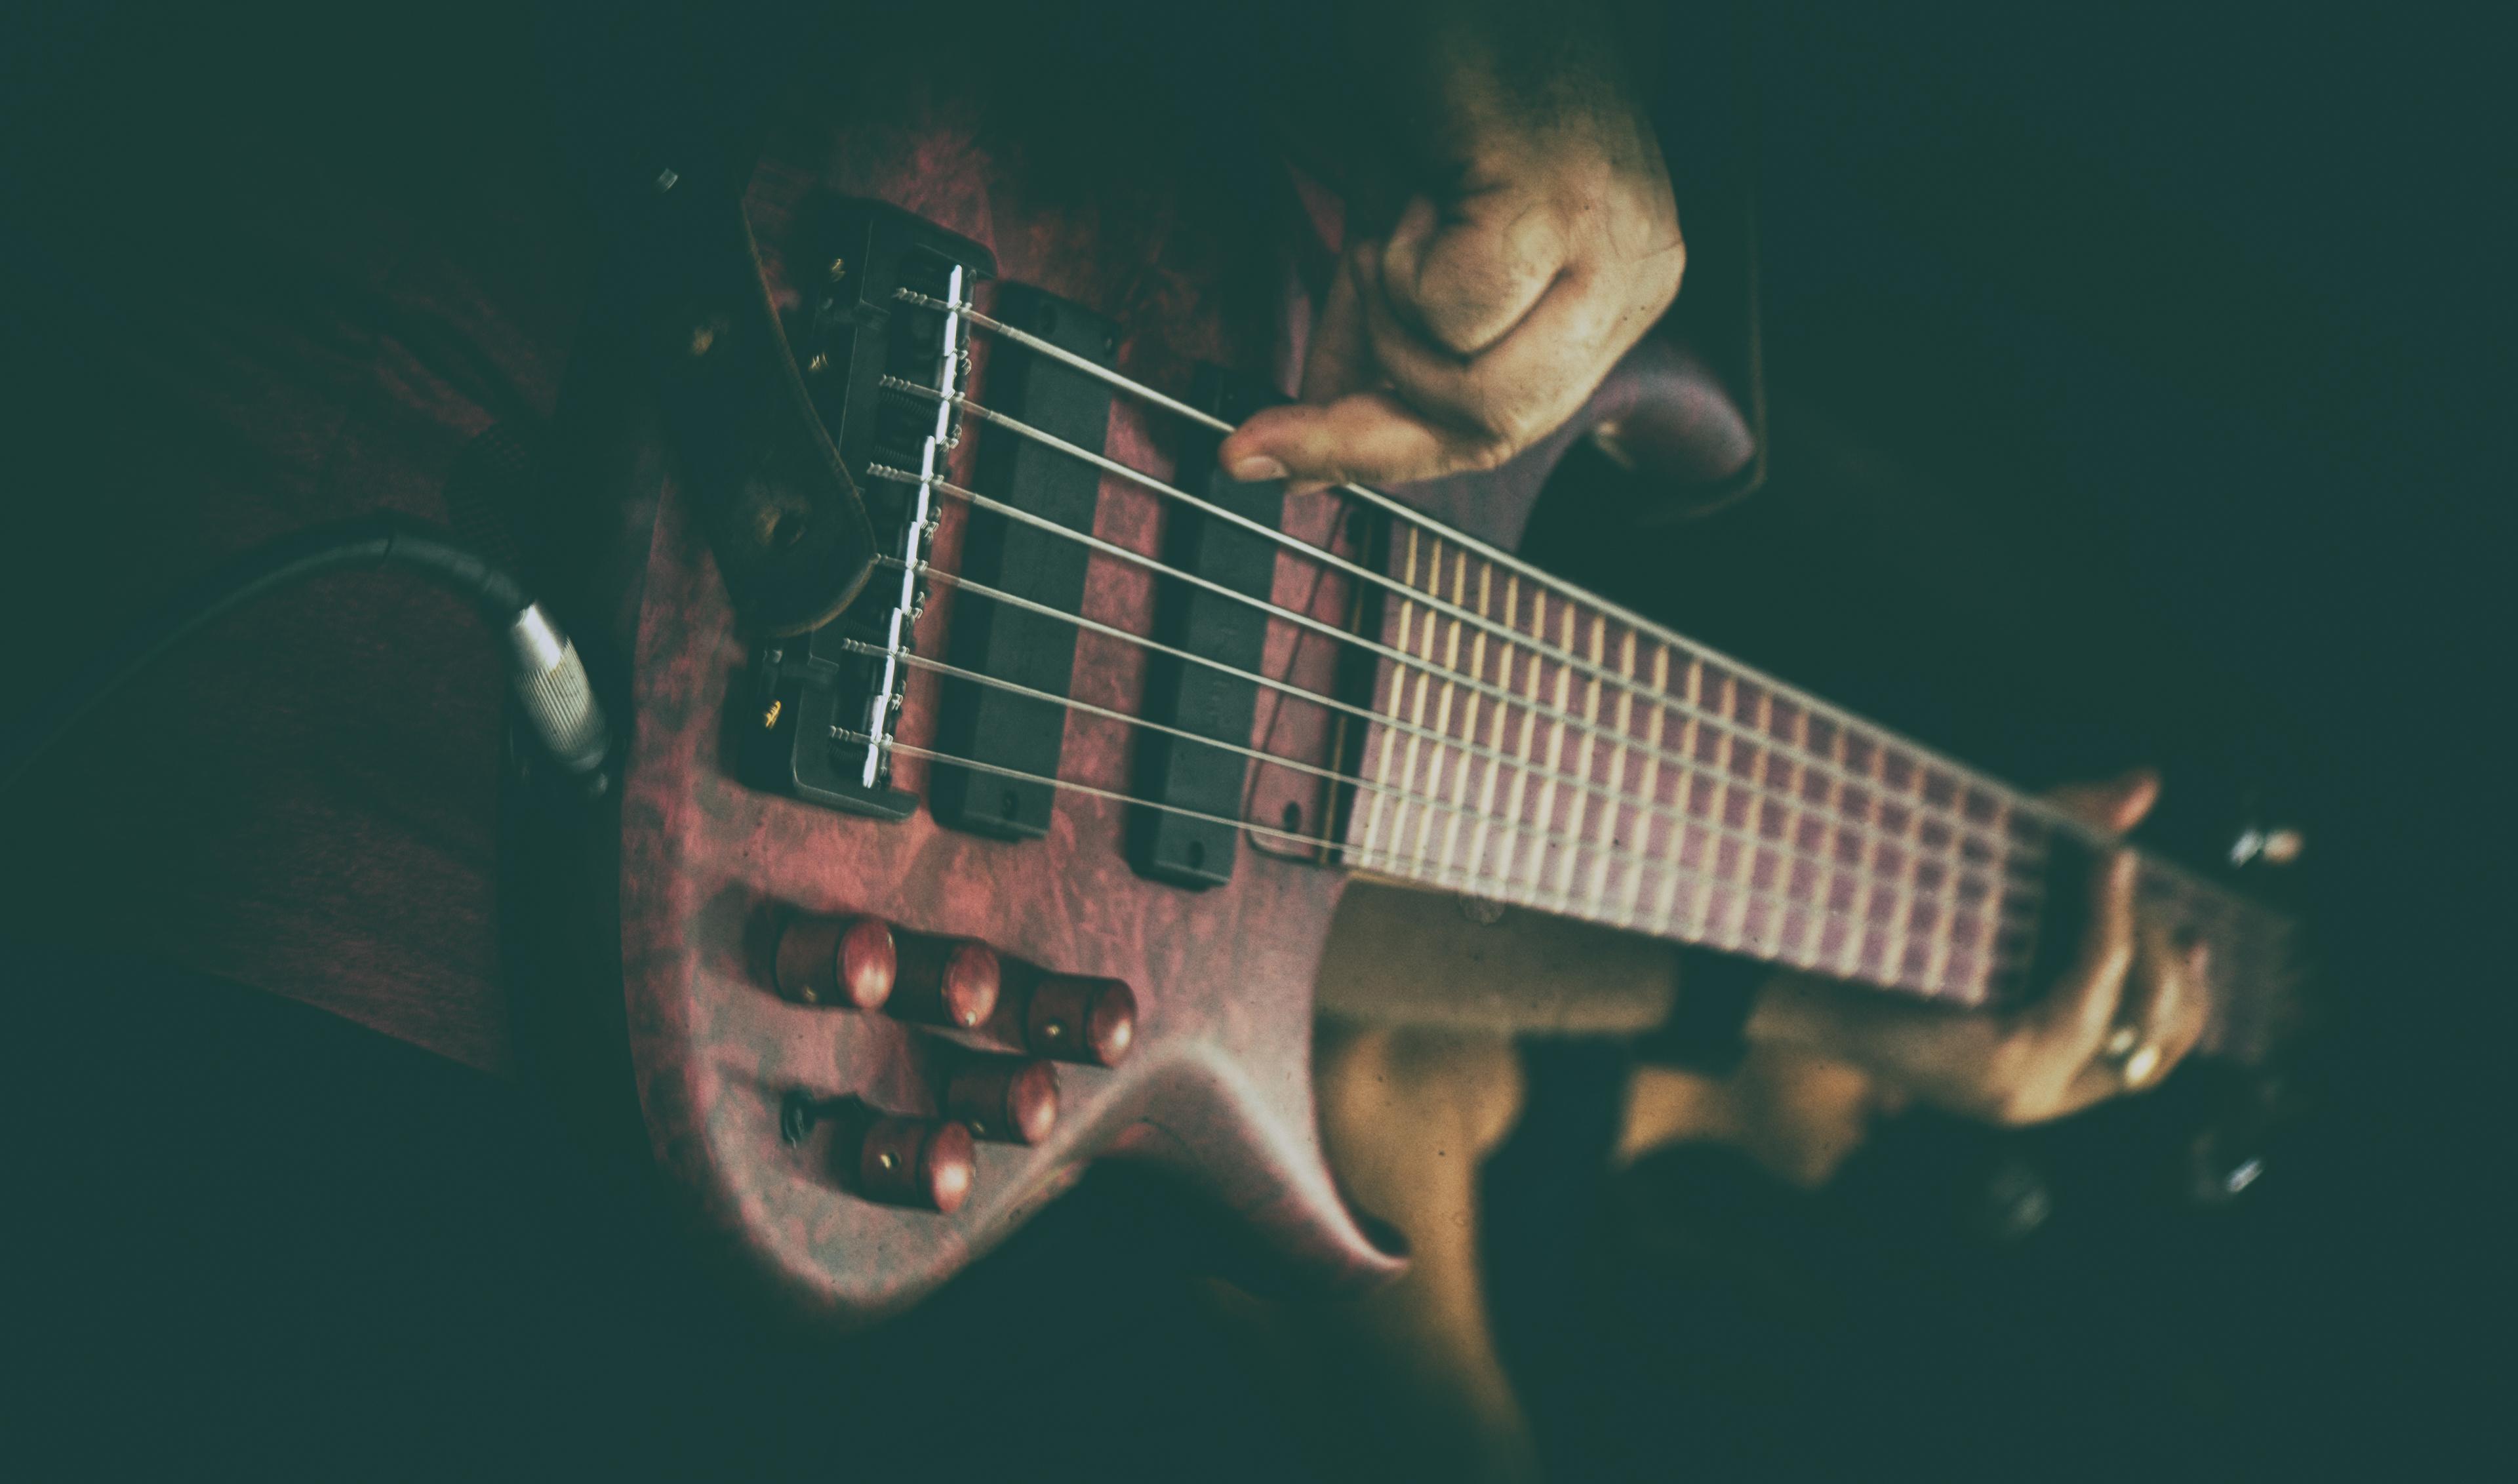 Guitarra 4k Ultra Fondo De Pantalla Hd Fondo De Escritorio 3840x2263 Id 713628 Wallpaper Abyss